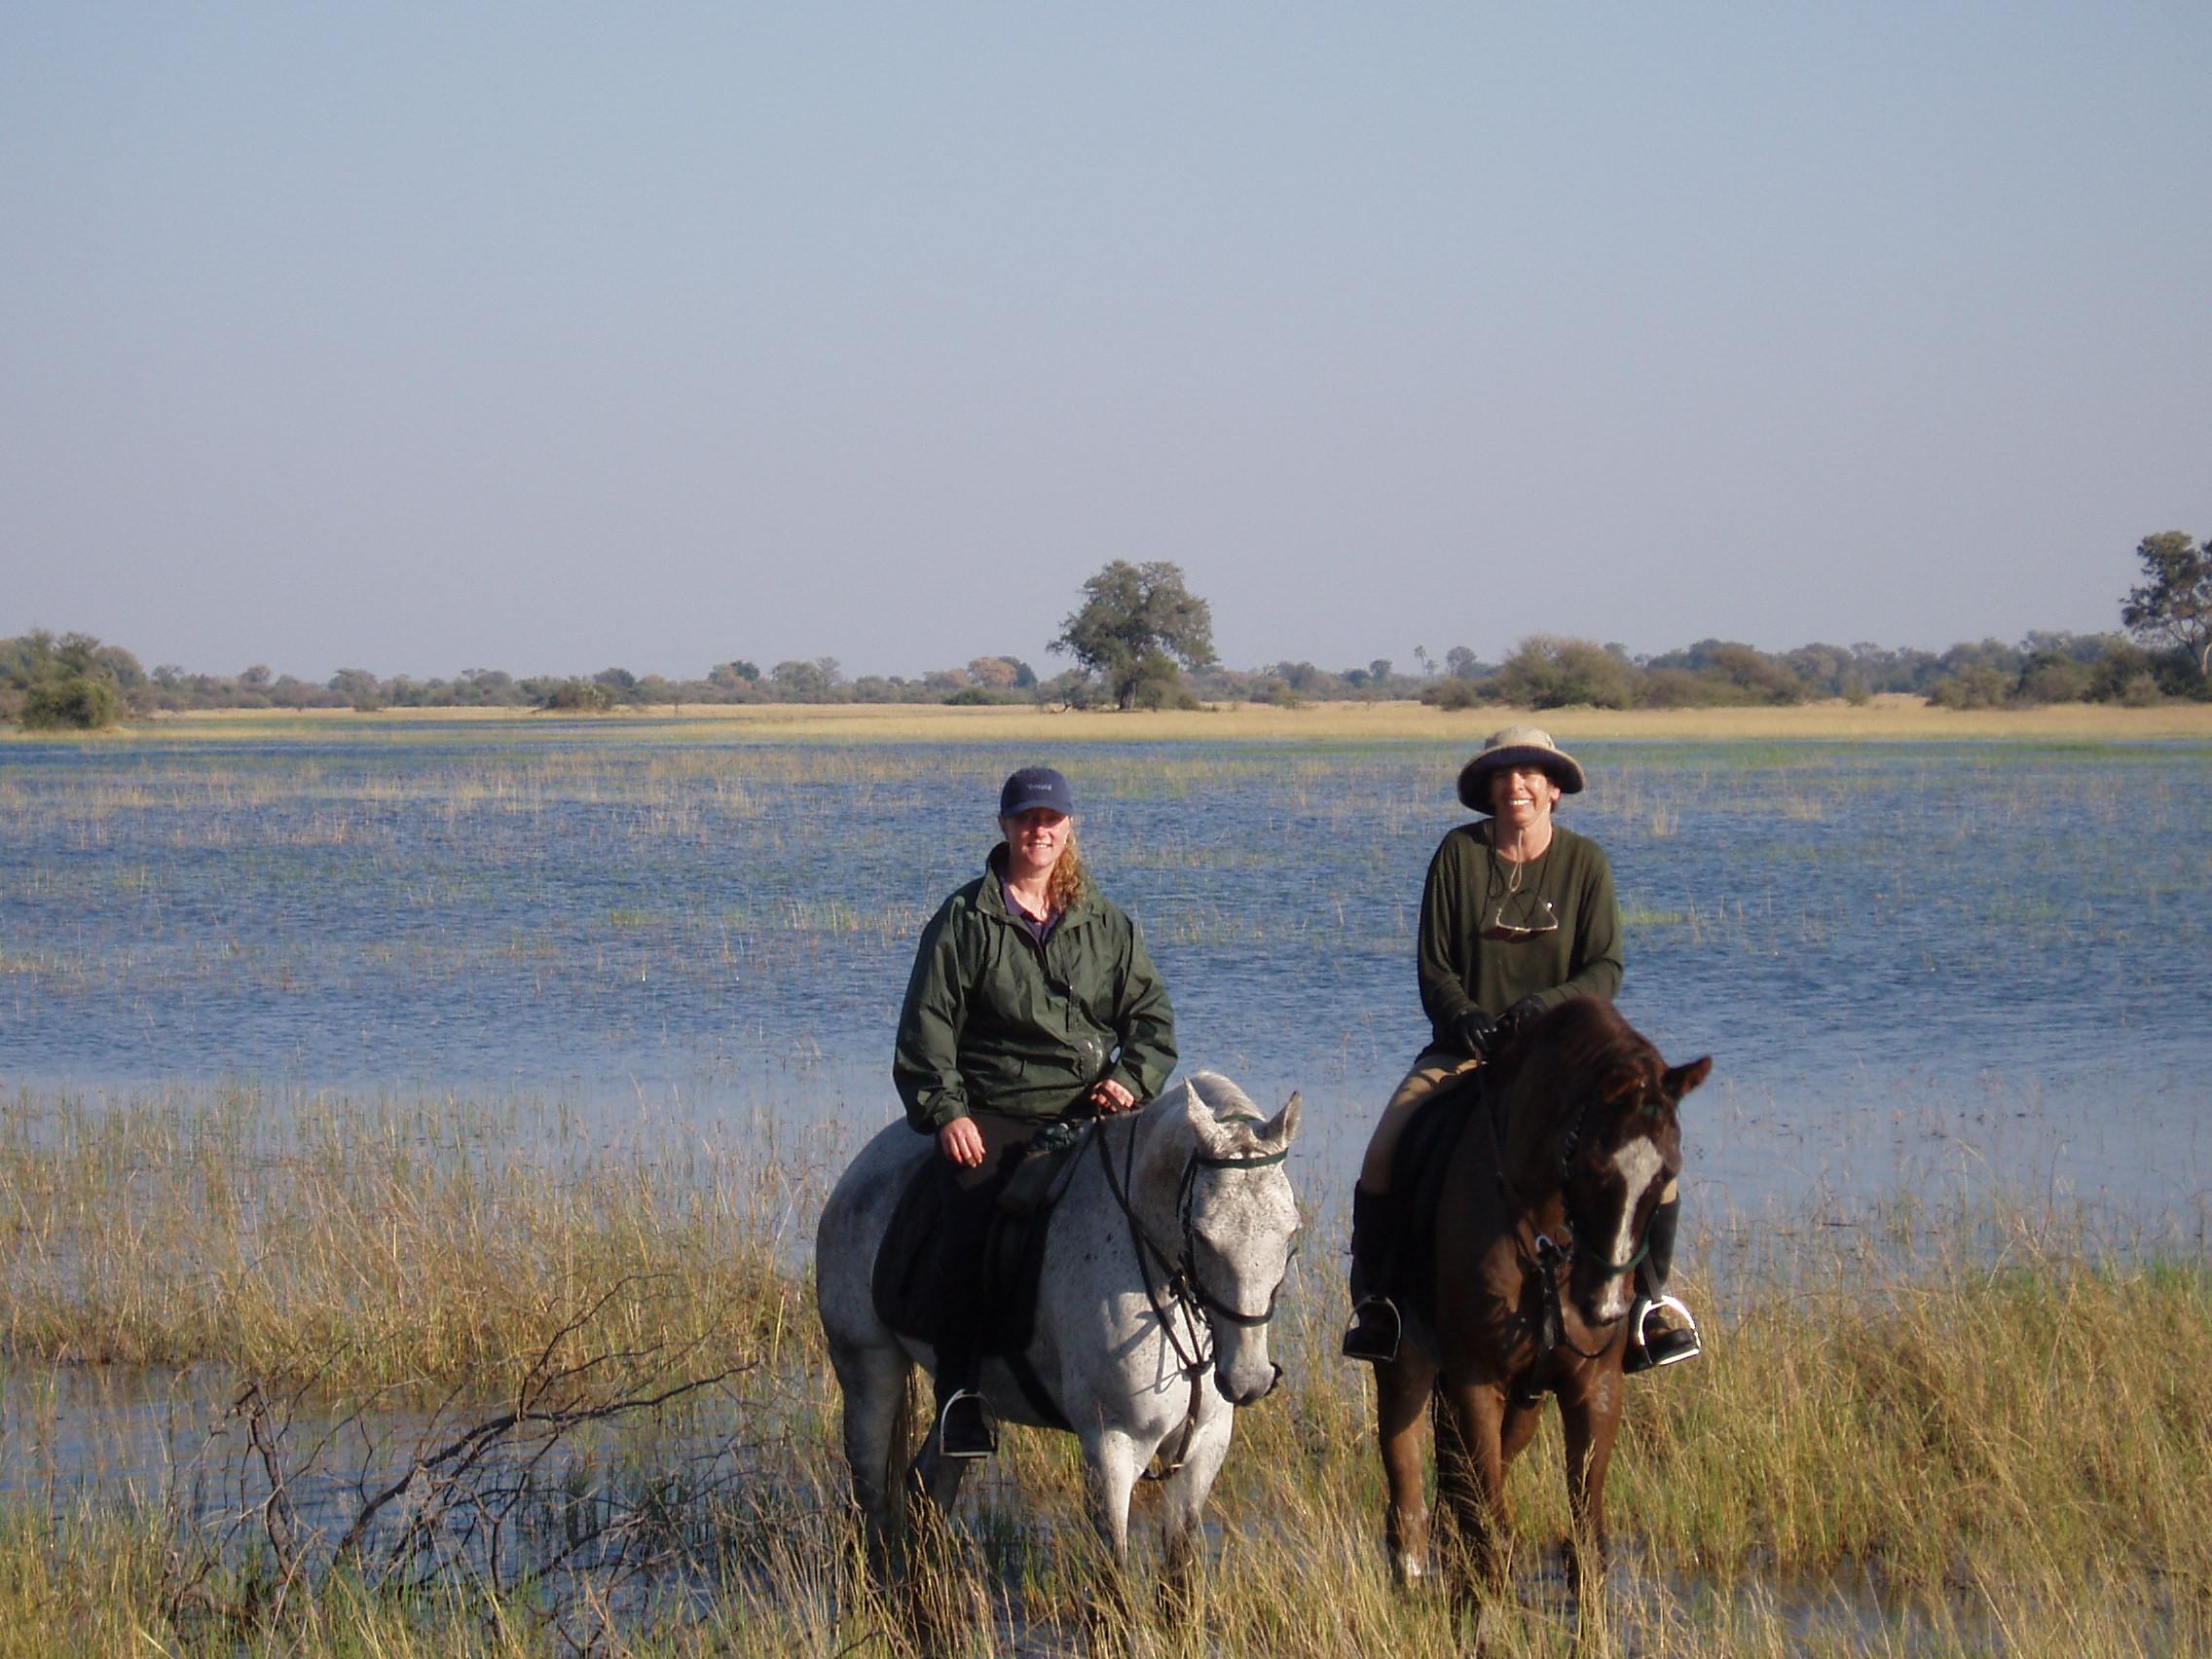 Chris enjoying an adventure at Macatoo, Botswana